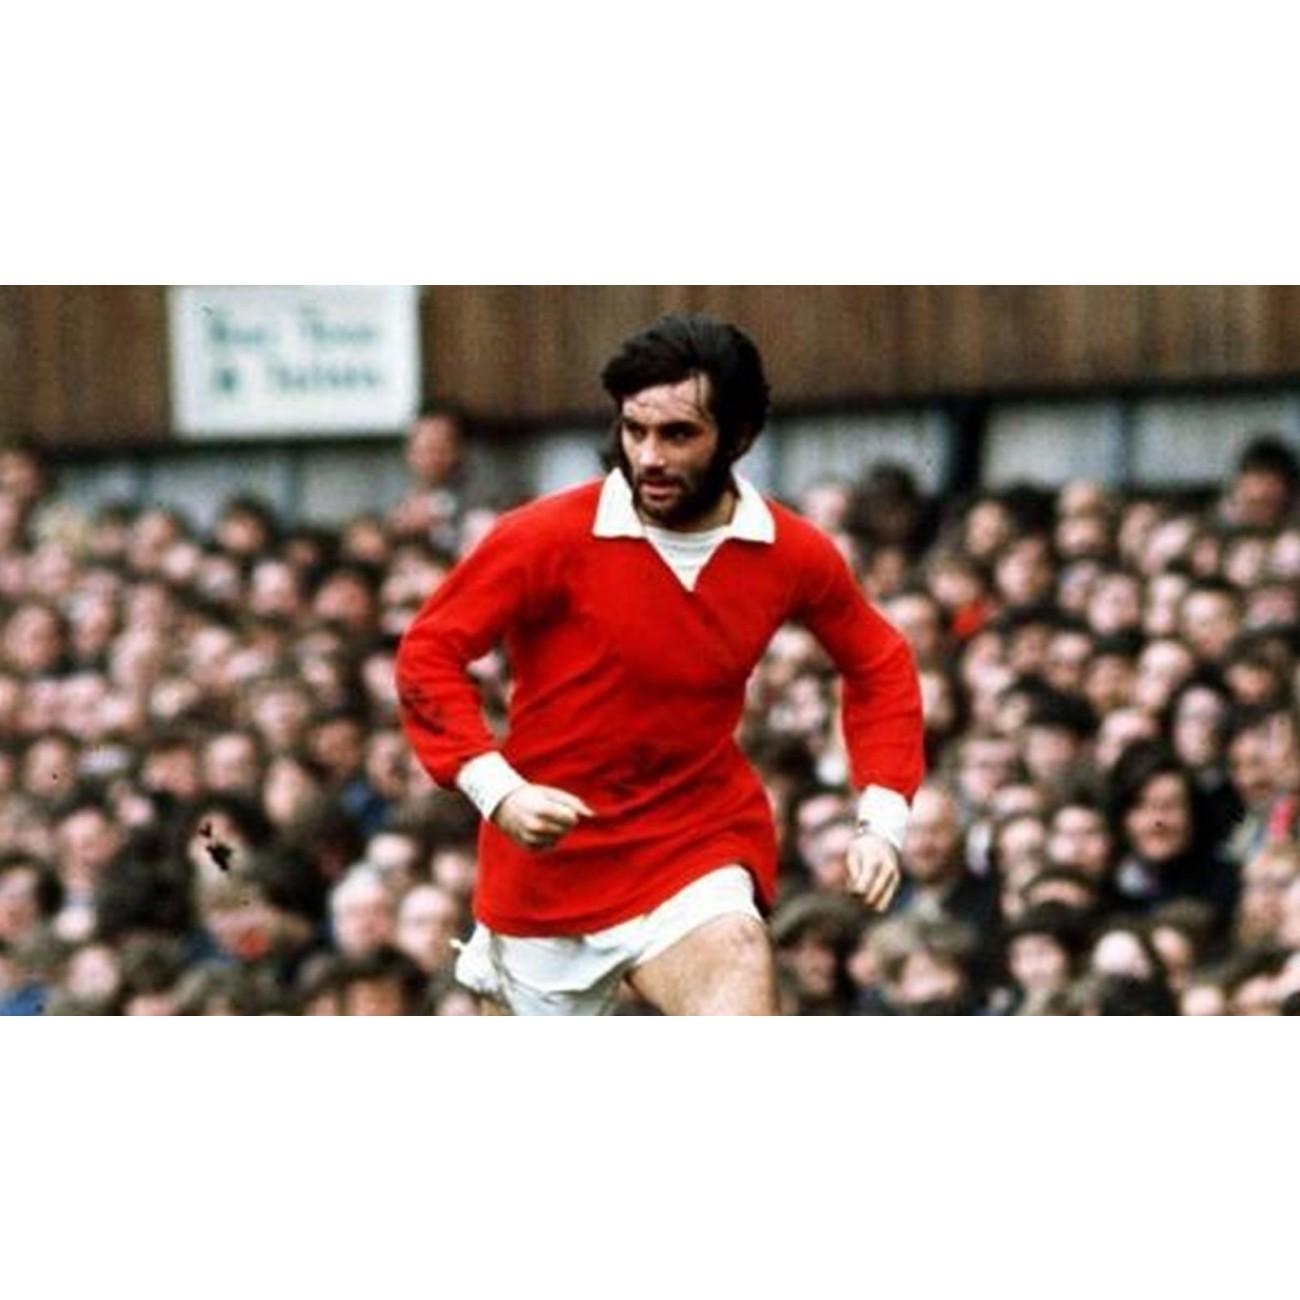 Manchester United 70 s retro shirt worn by Best